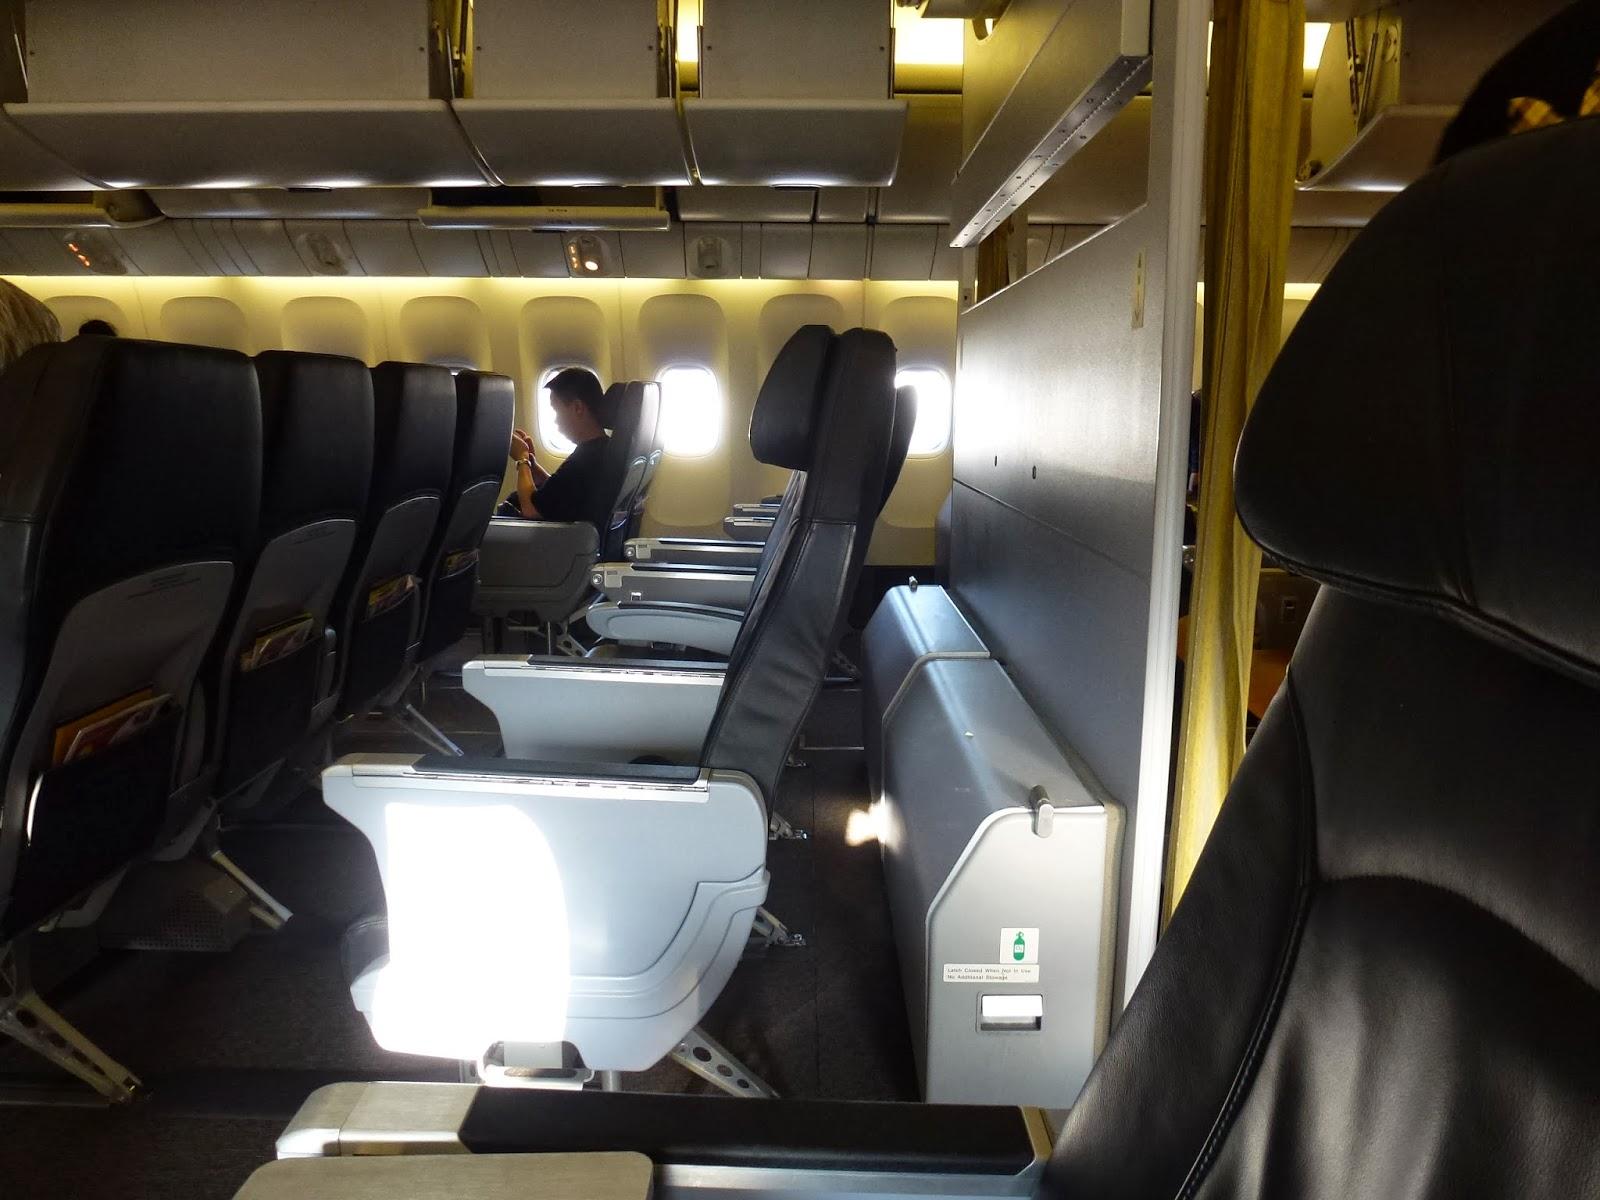 scoot airline singapore budget airline. Black Bedroom Furniture Sets. Home Design Ideas